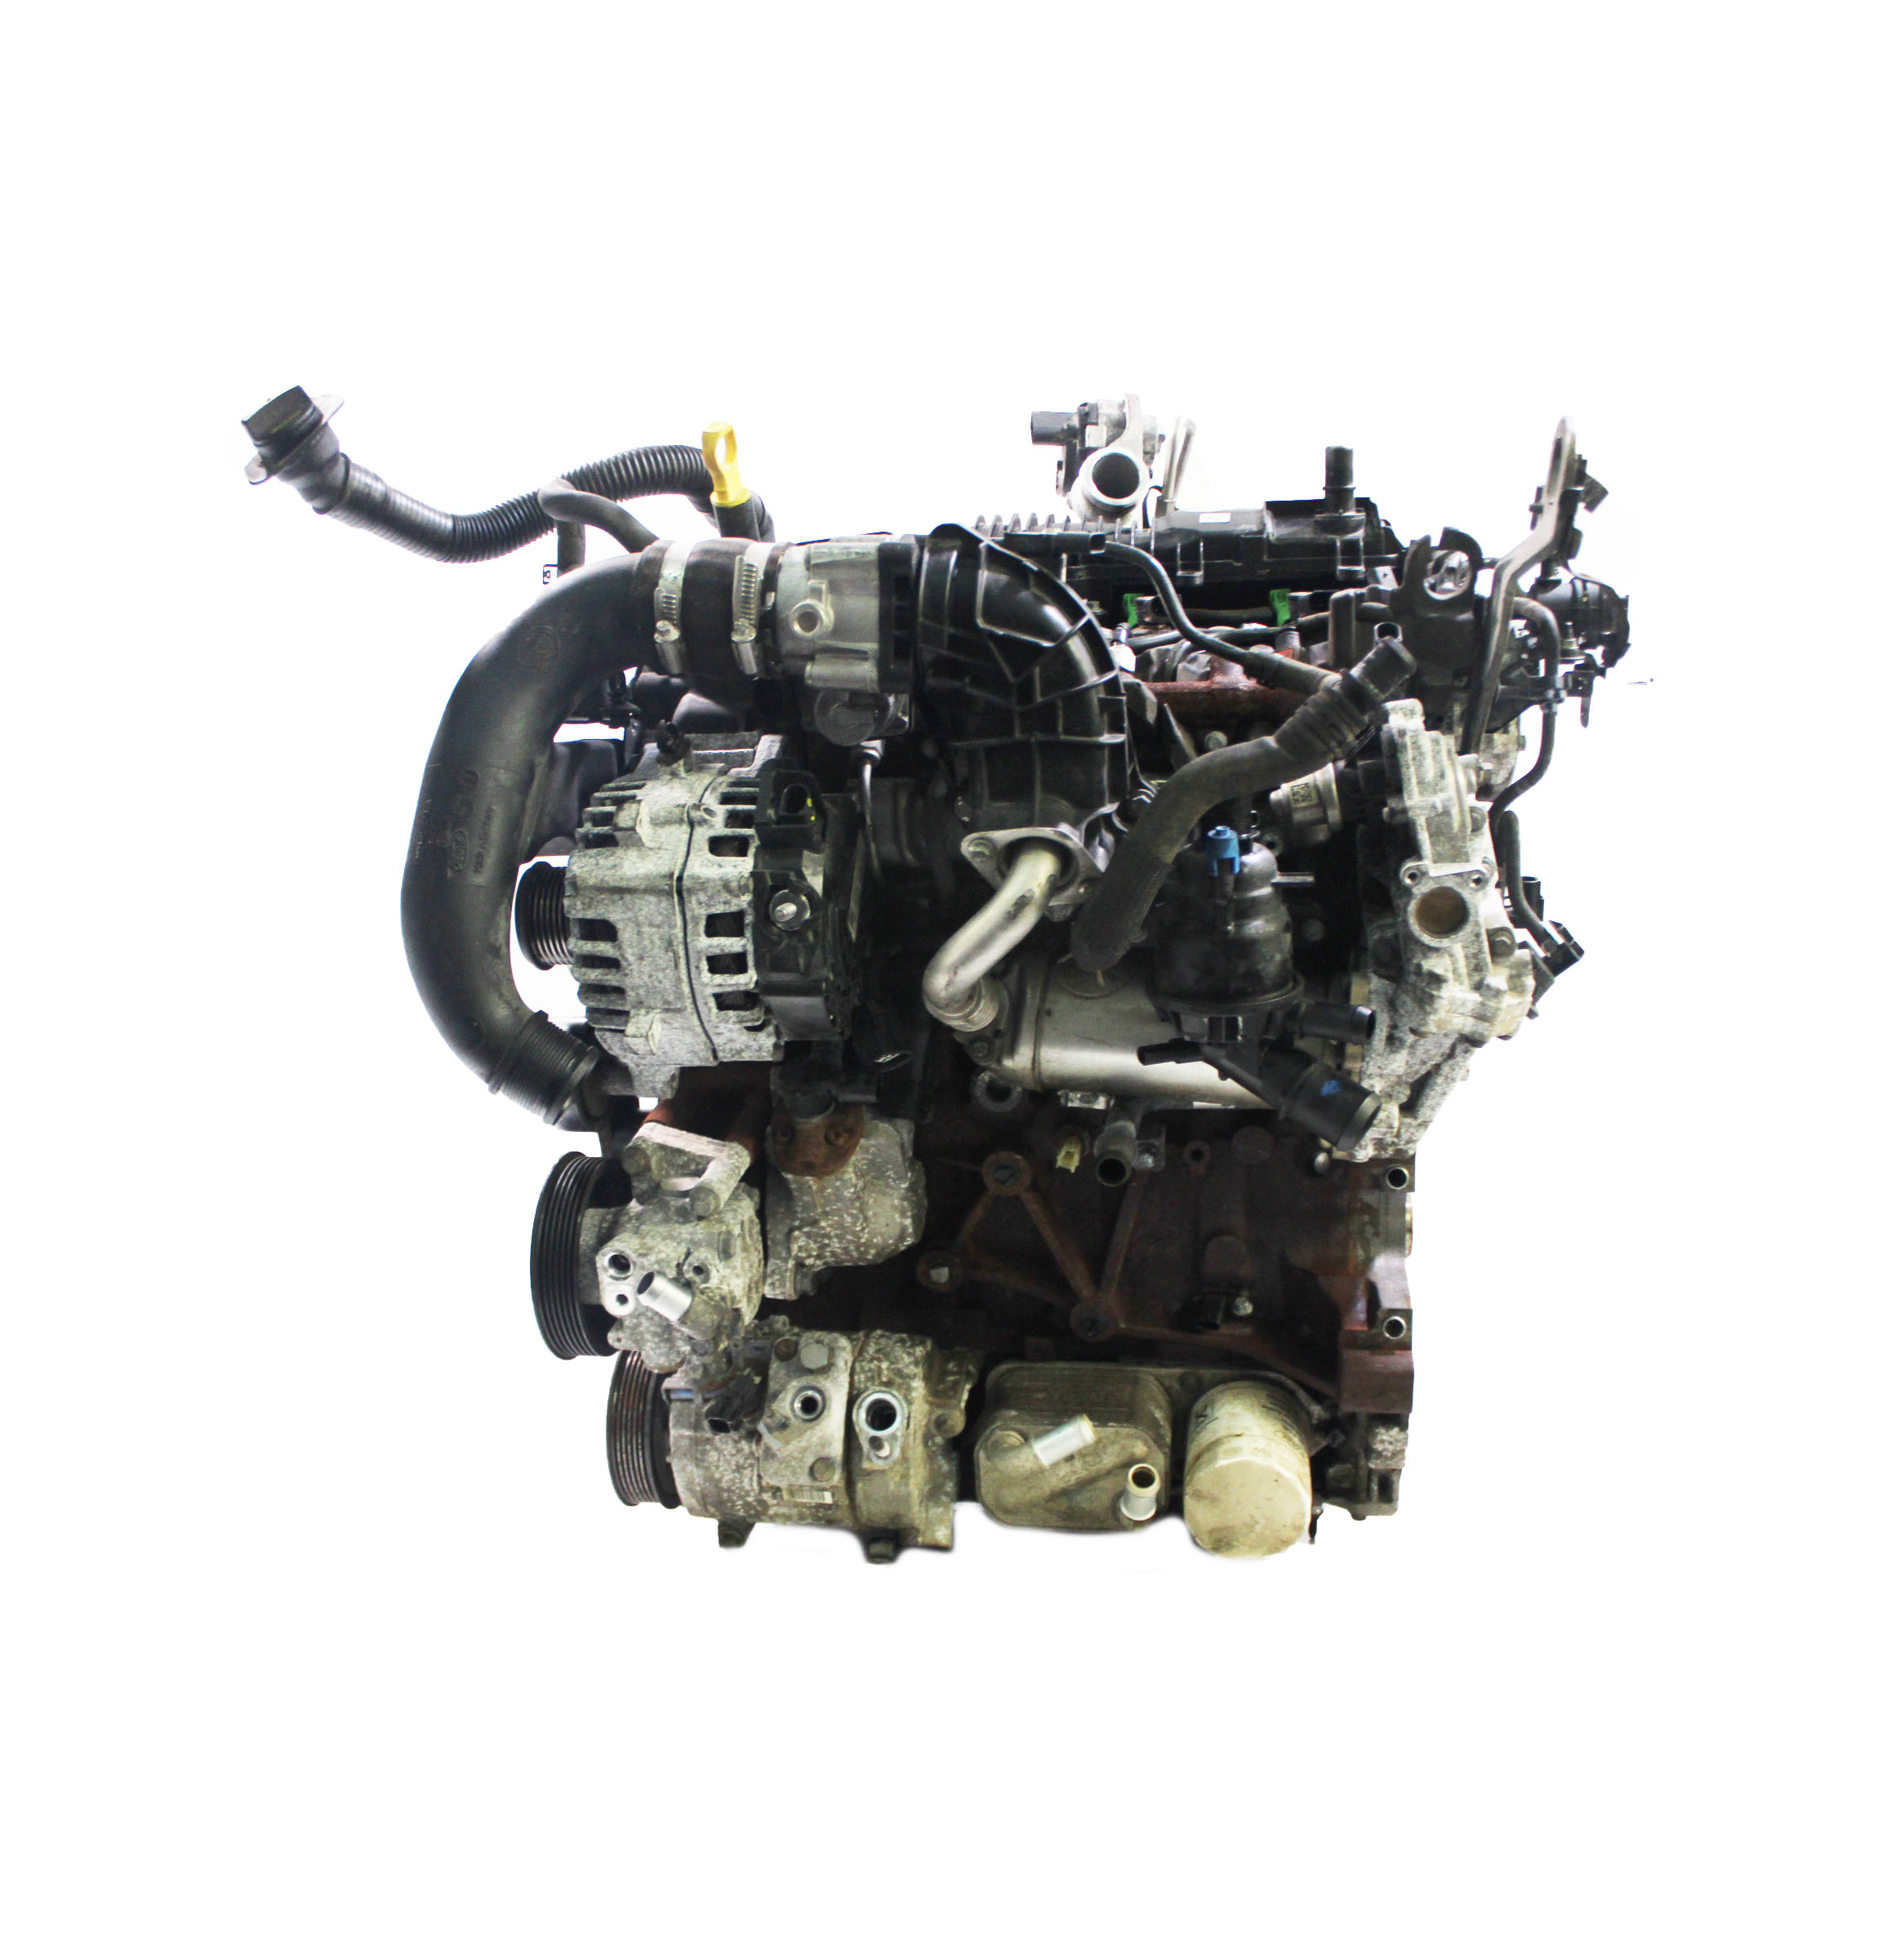 Motor für Ford Transit V363 2,0 EcoBlue Diesel D YMF6 130 PS